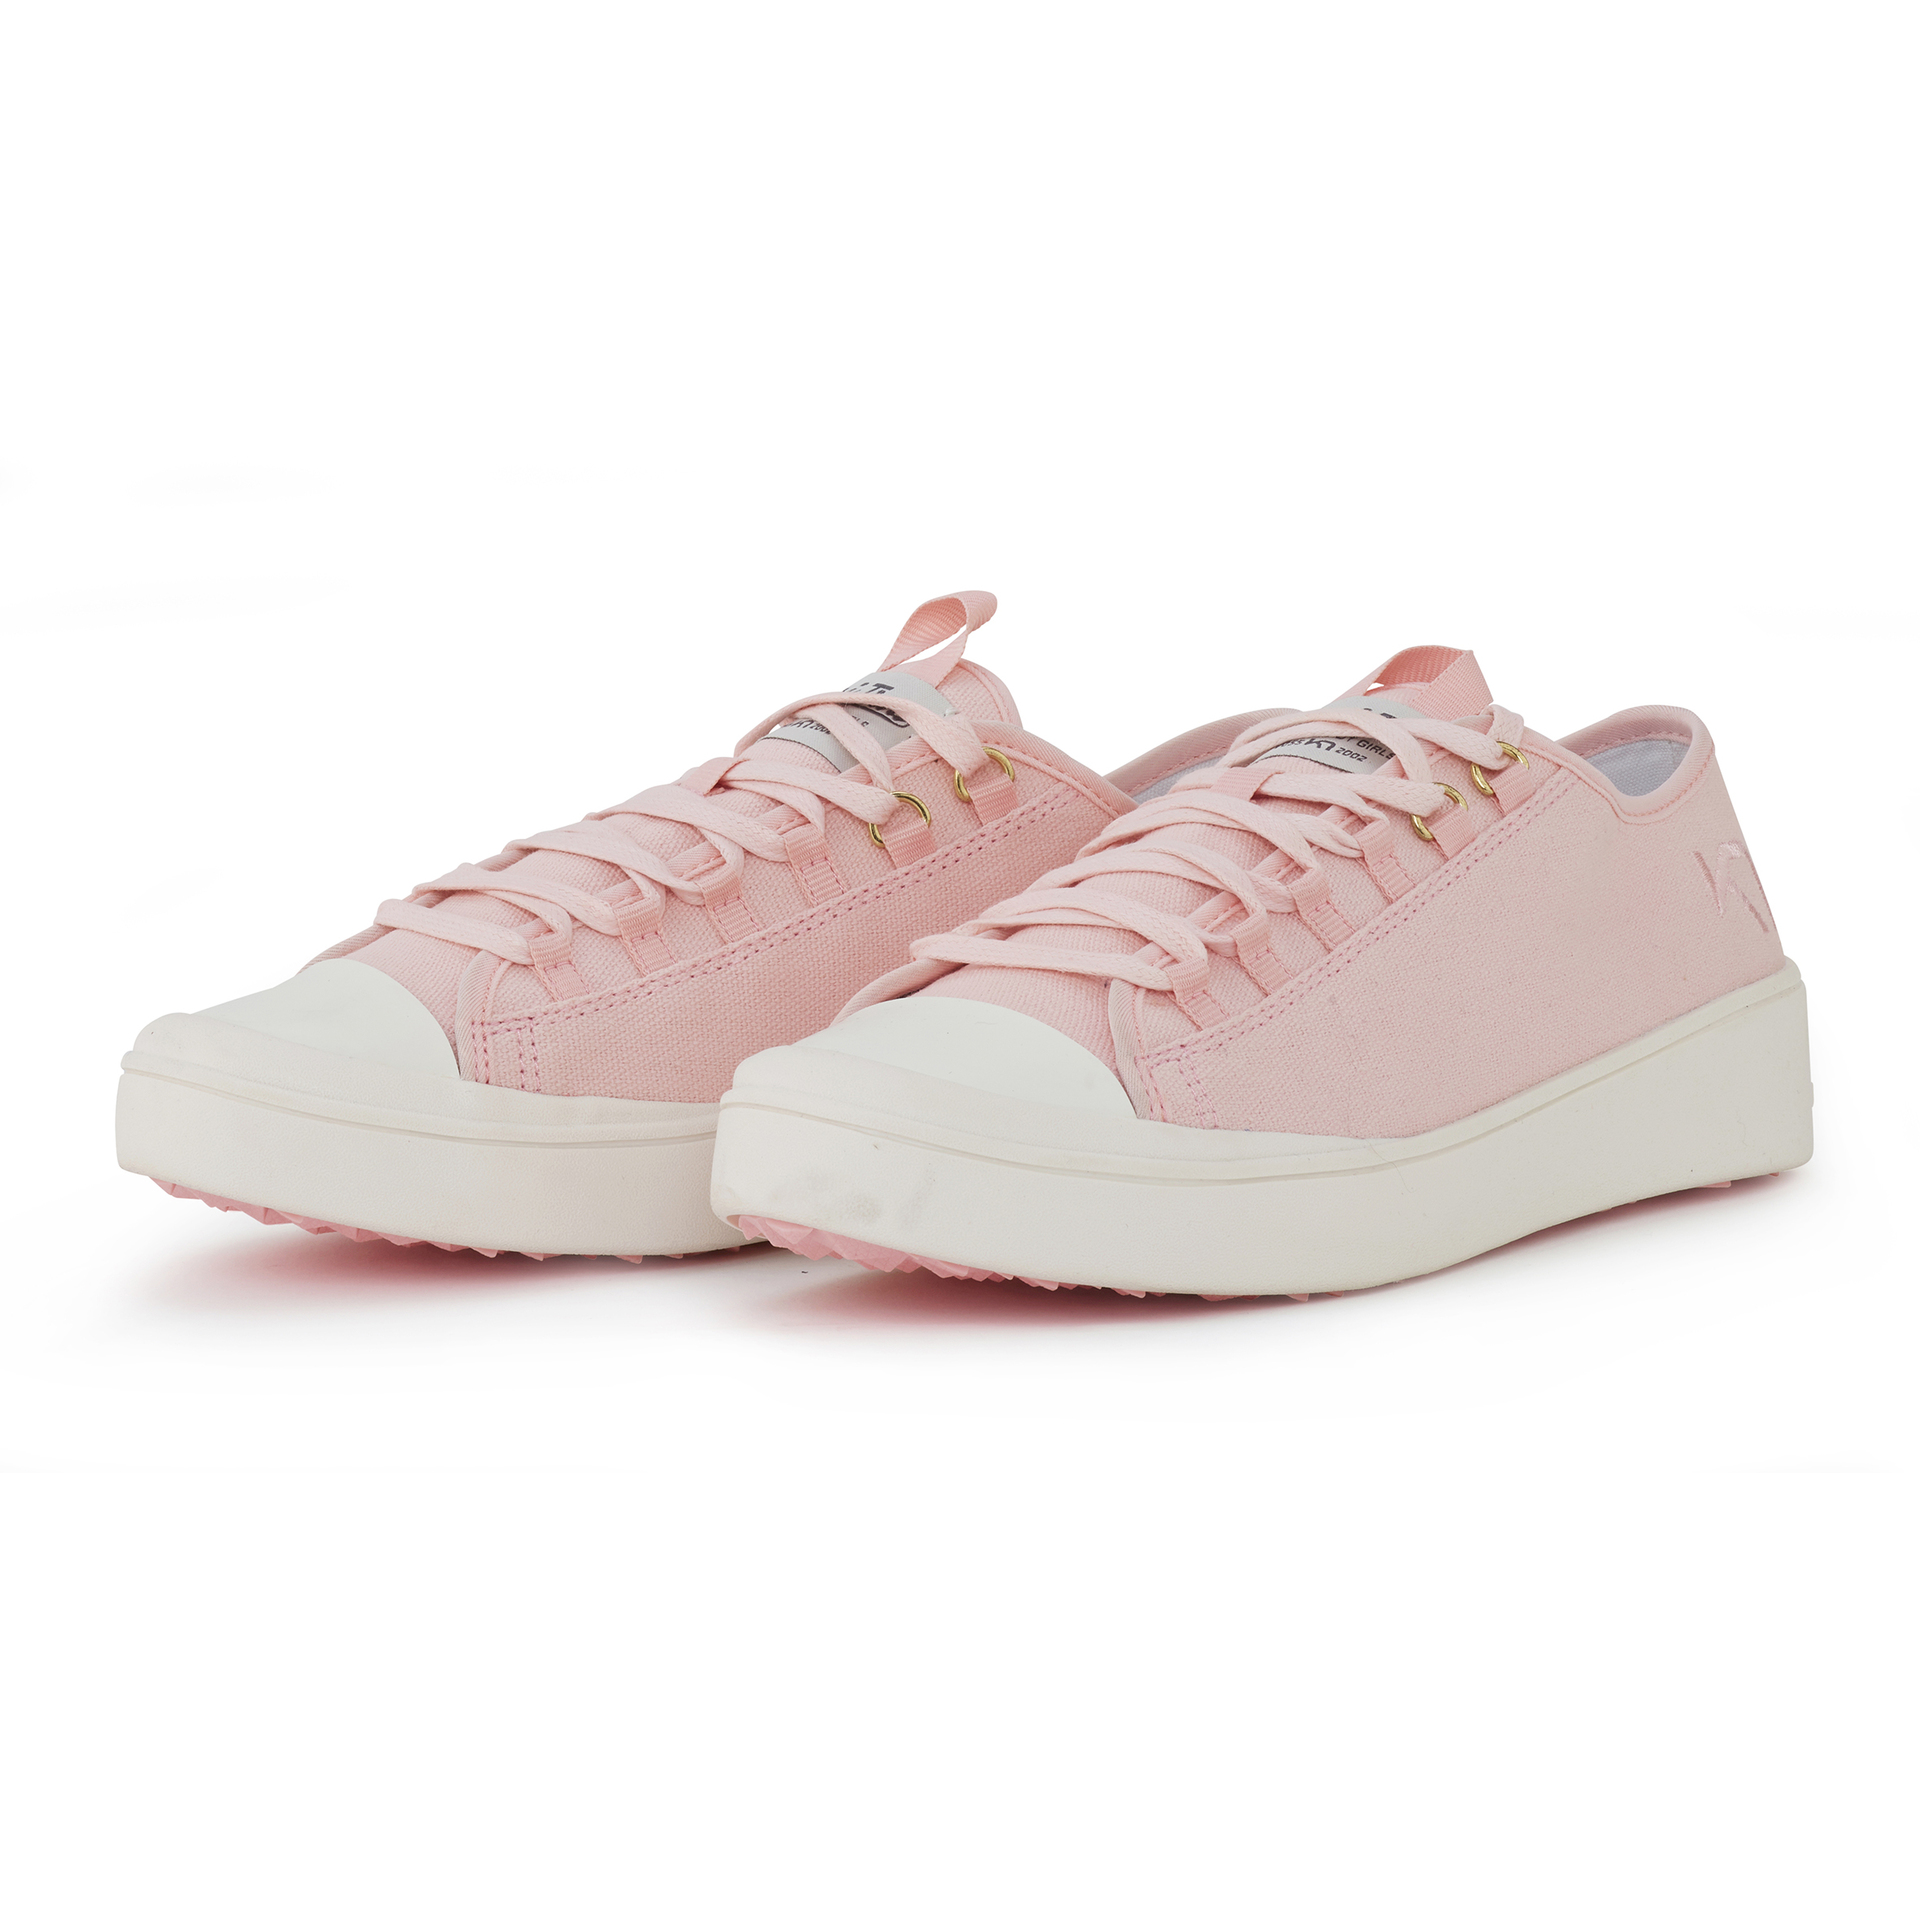 Kari Traa Sprade sko